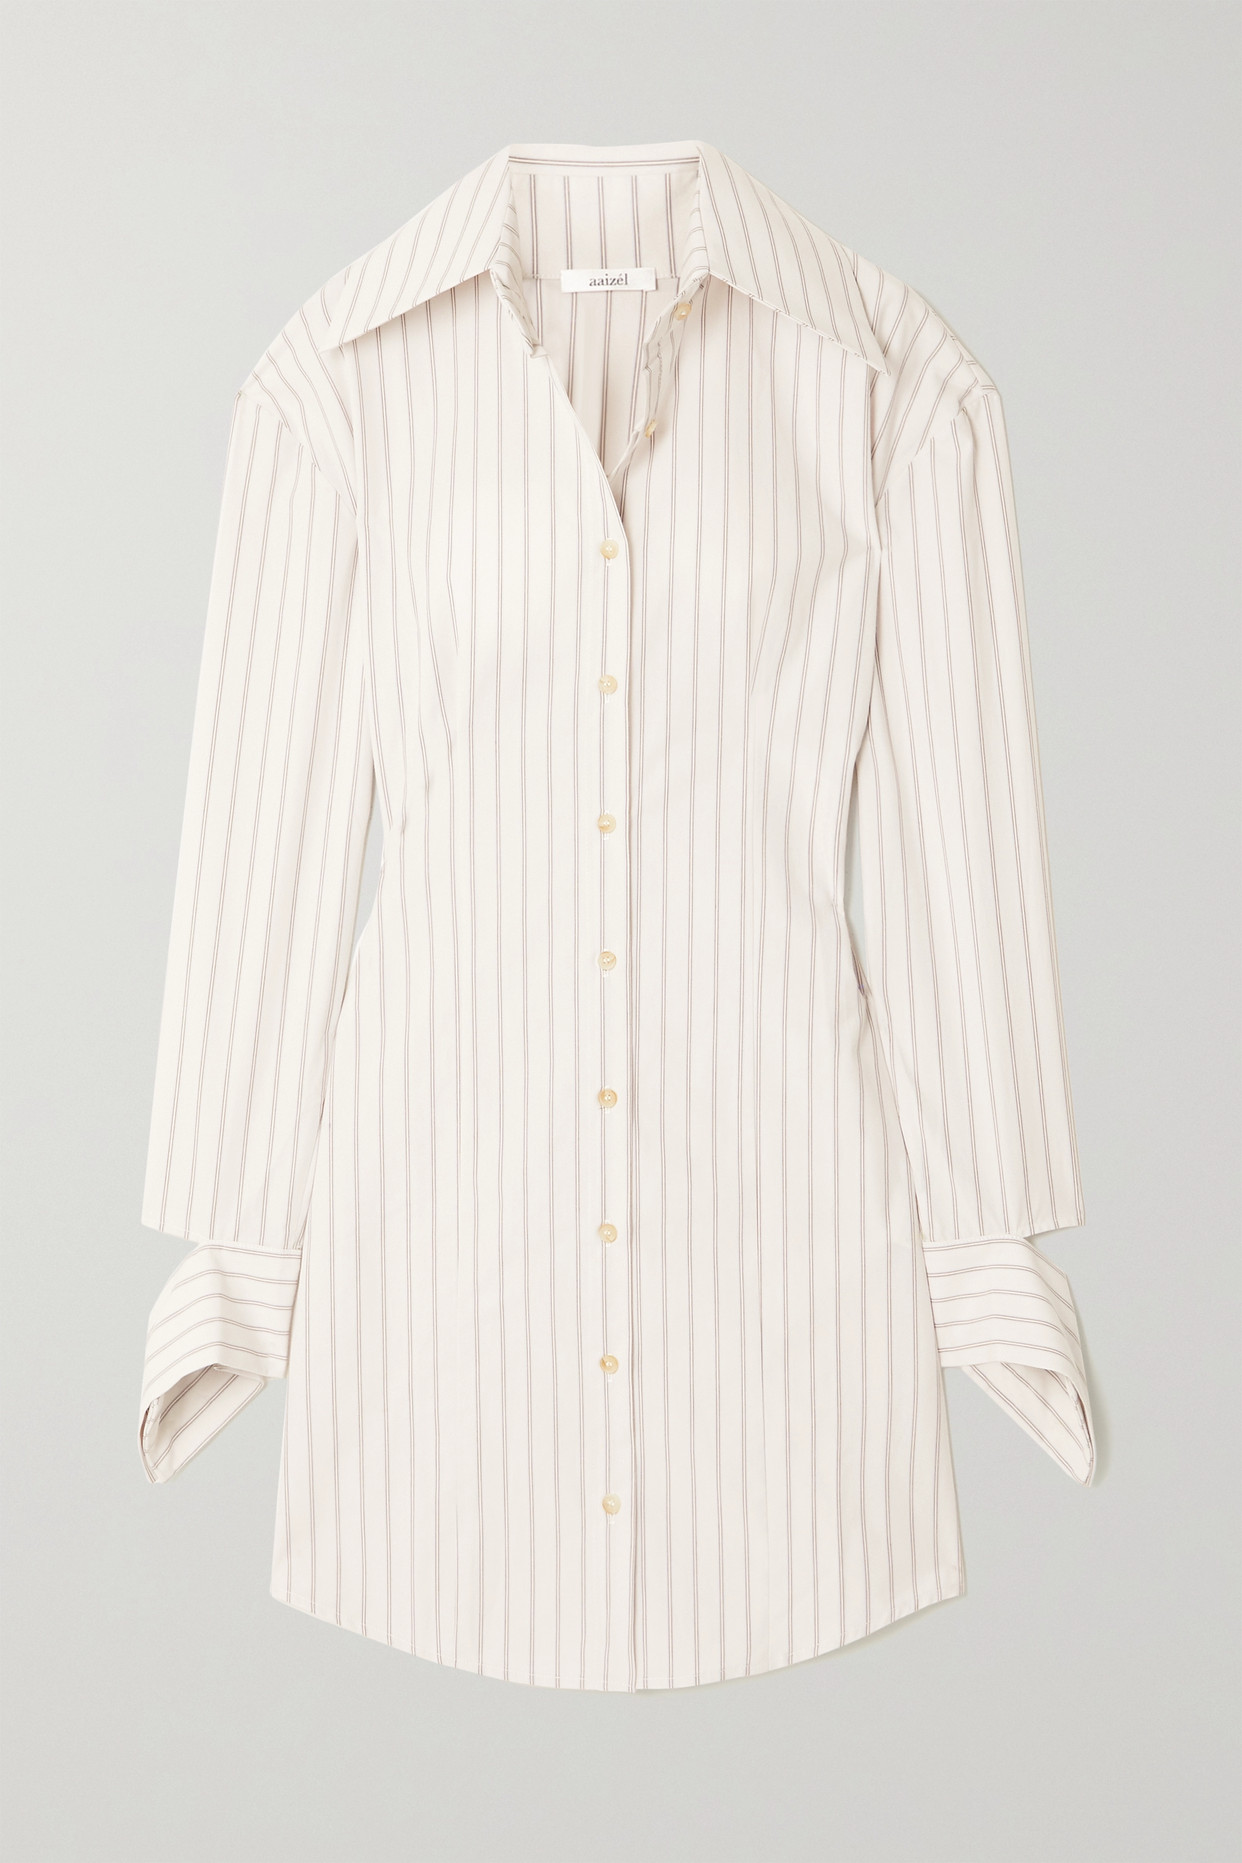 AAIZÉL - + Net Sustain Striped Cotton-poplin Shirt Dress - Ivory - UK6